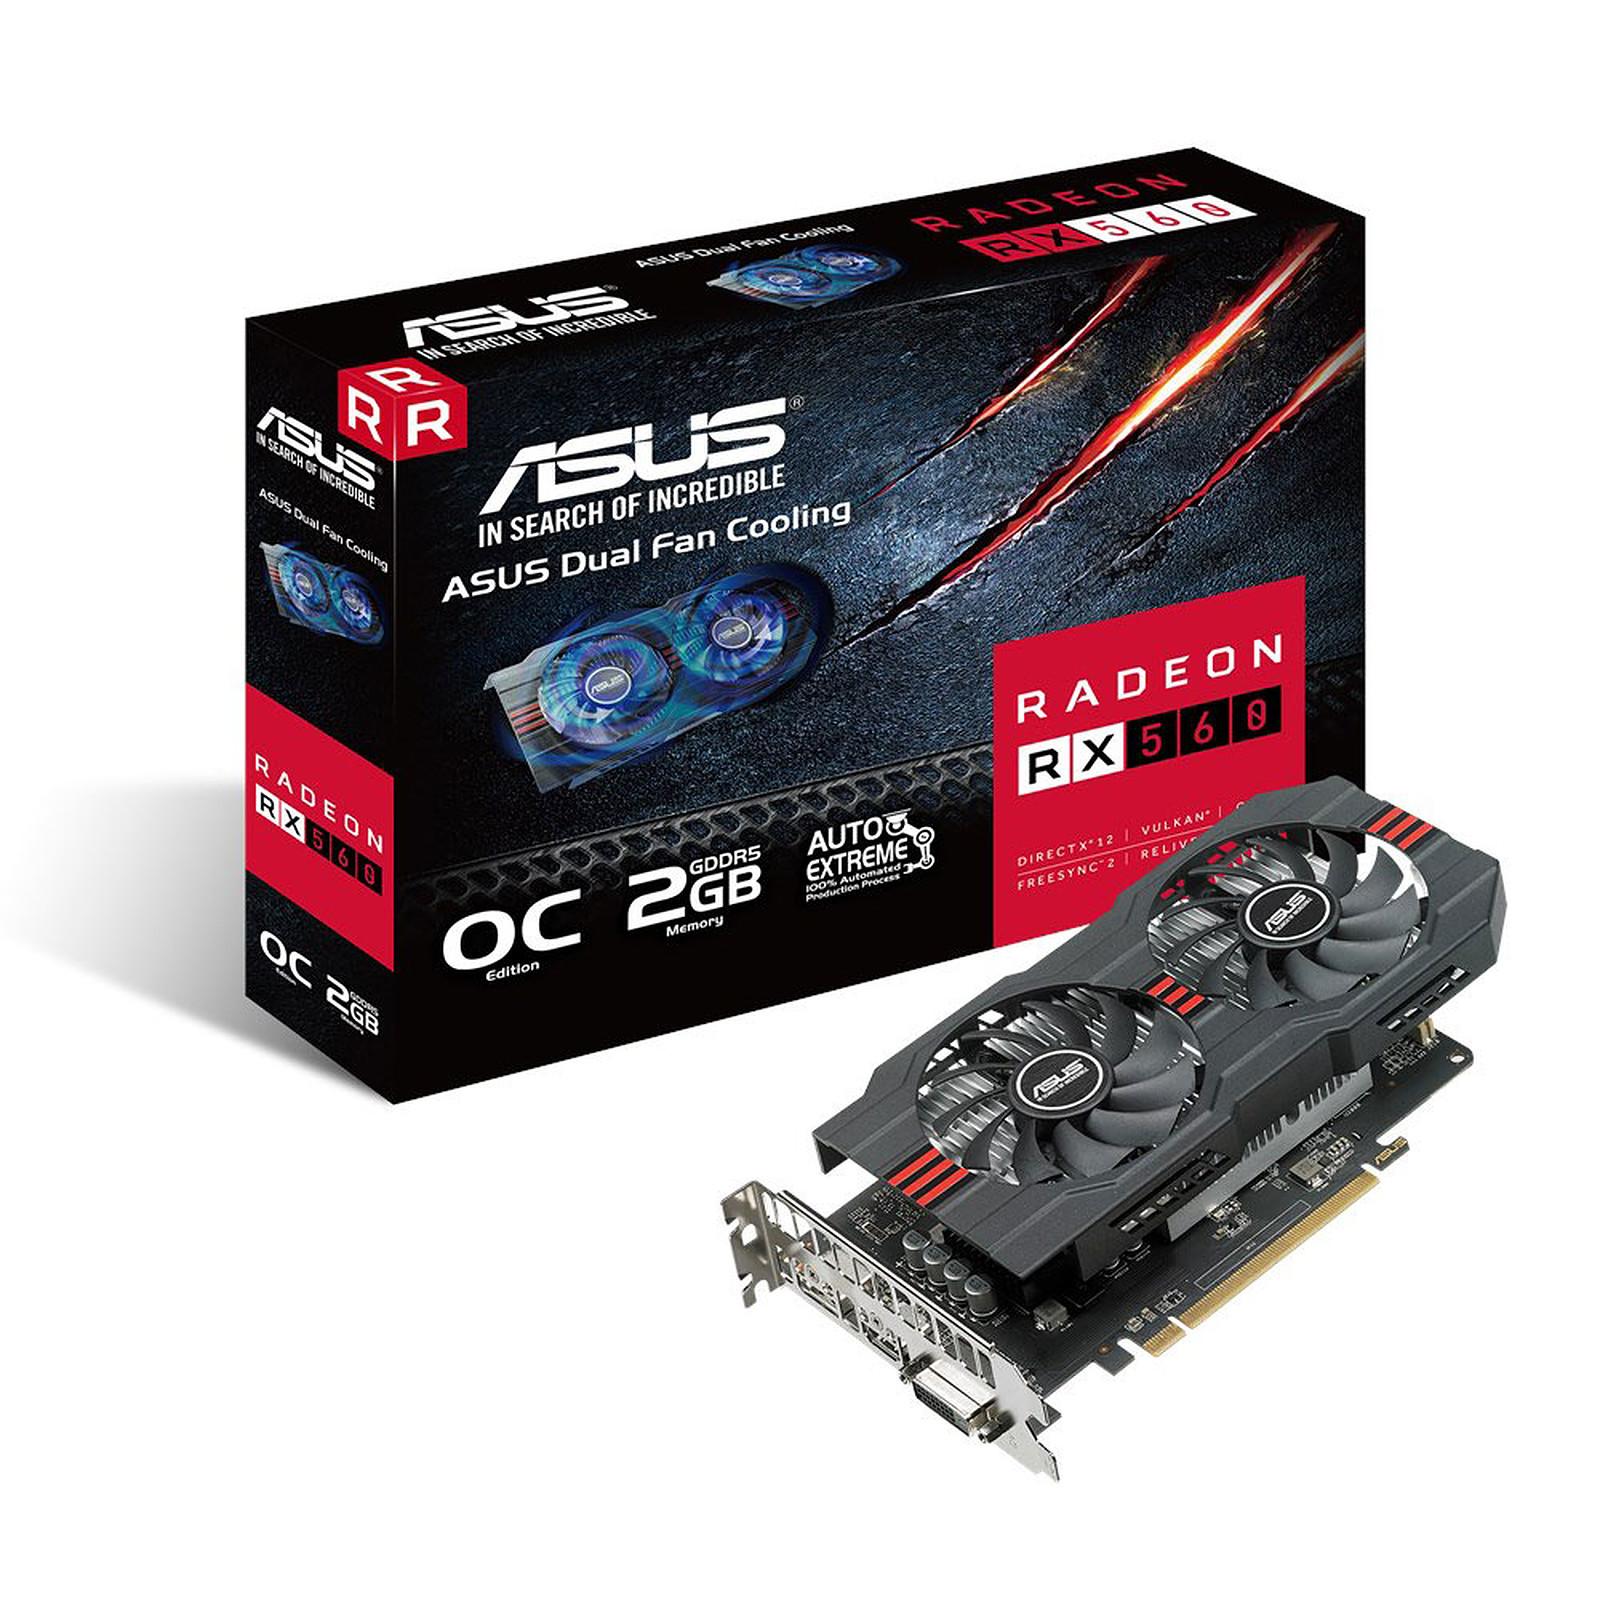 ASUS Radeon RX 560 2GB OC